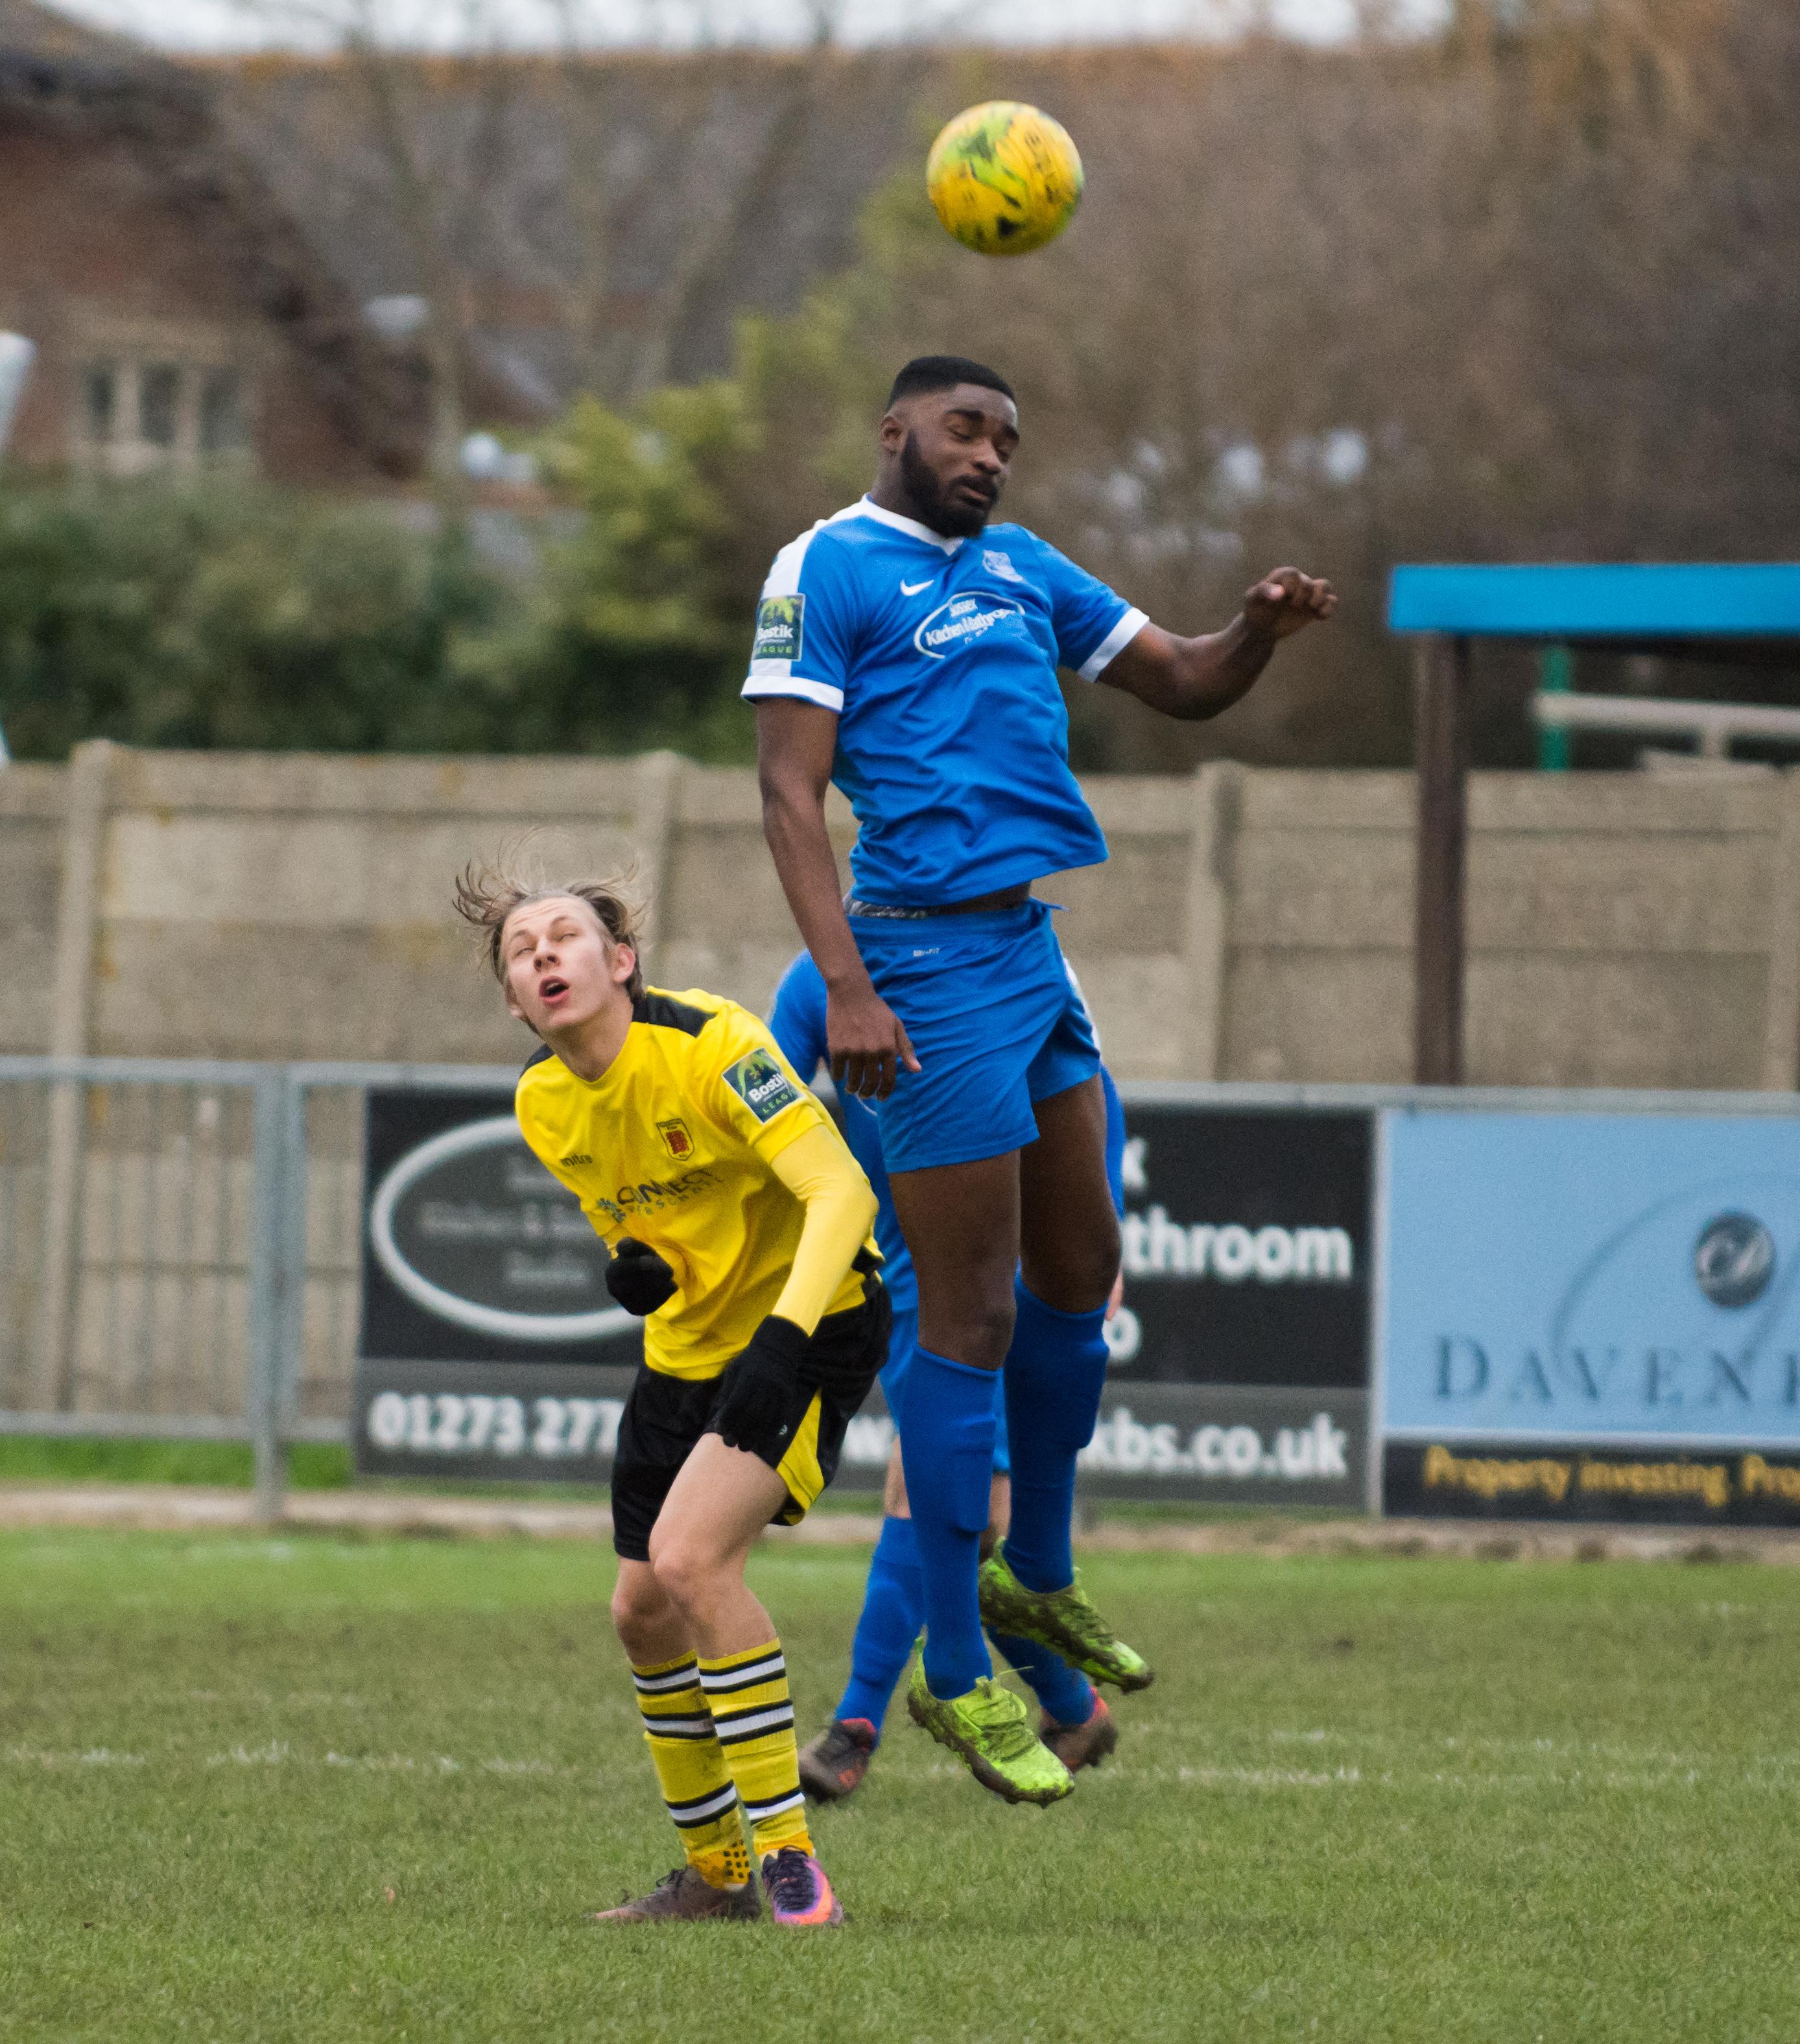 Shoreham FC vs Faversham Town 16.12.17 45